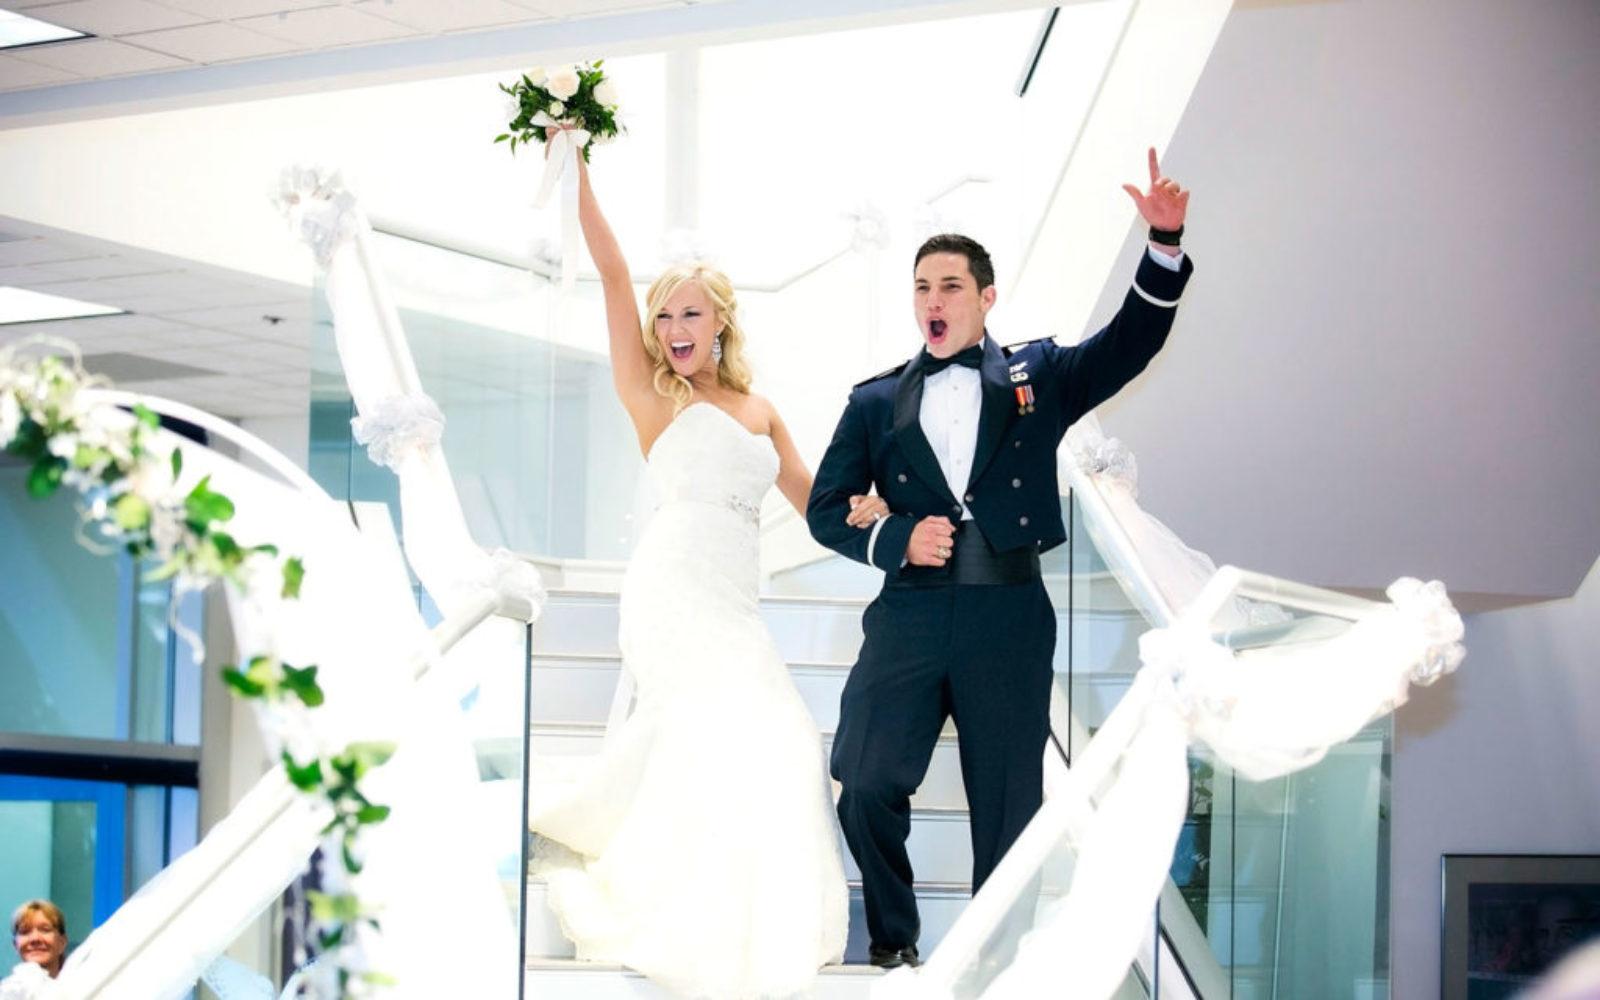 weddingphotographycoloradosprings_60-1024x640